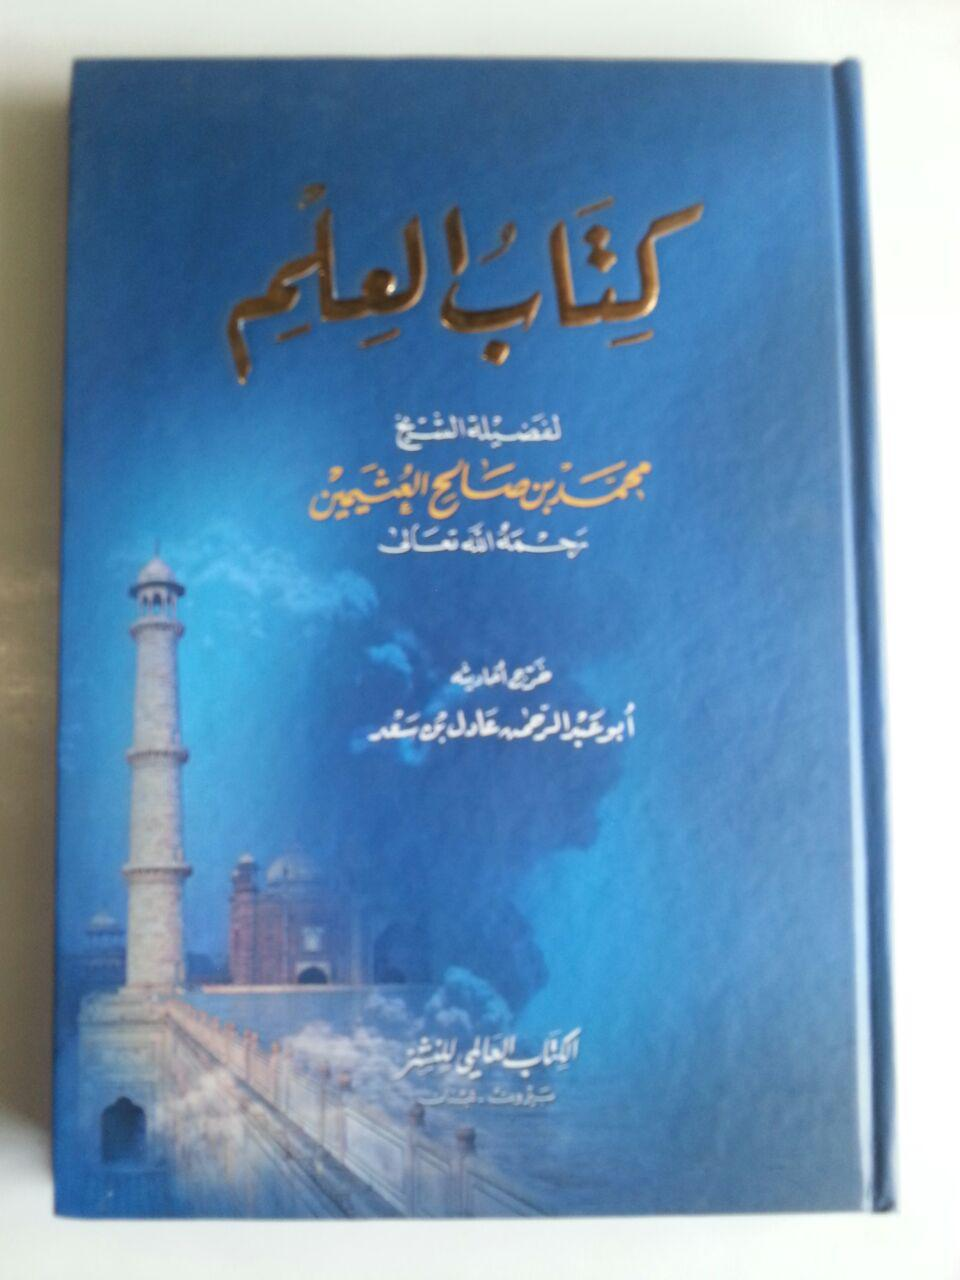 Kitab Kitabul Ilmi Syaikh Utsaimin cover 2